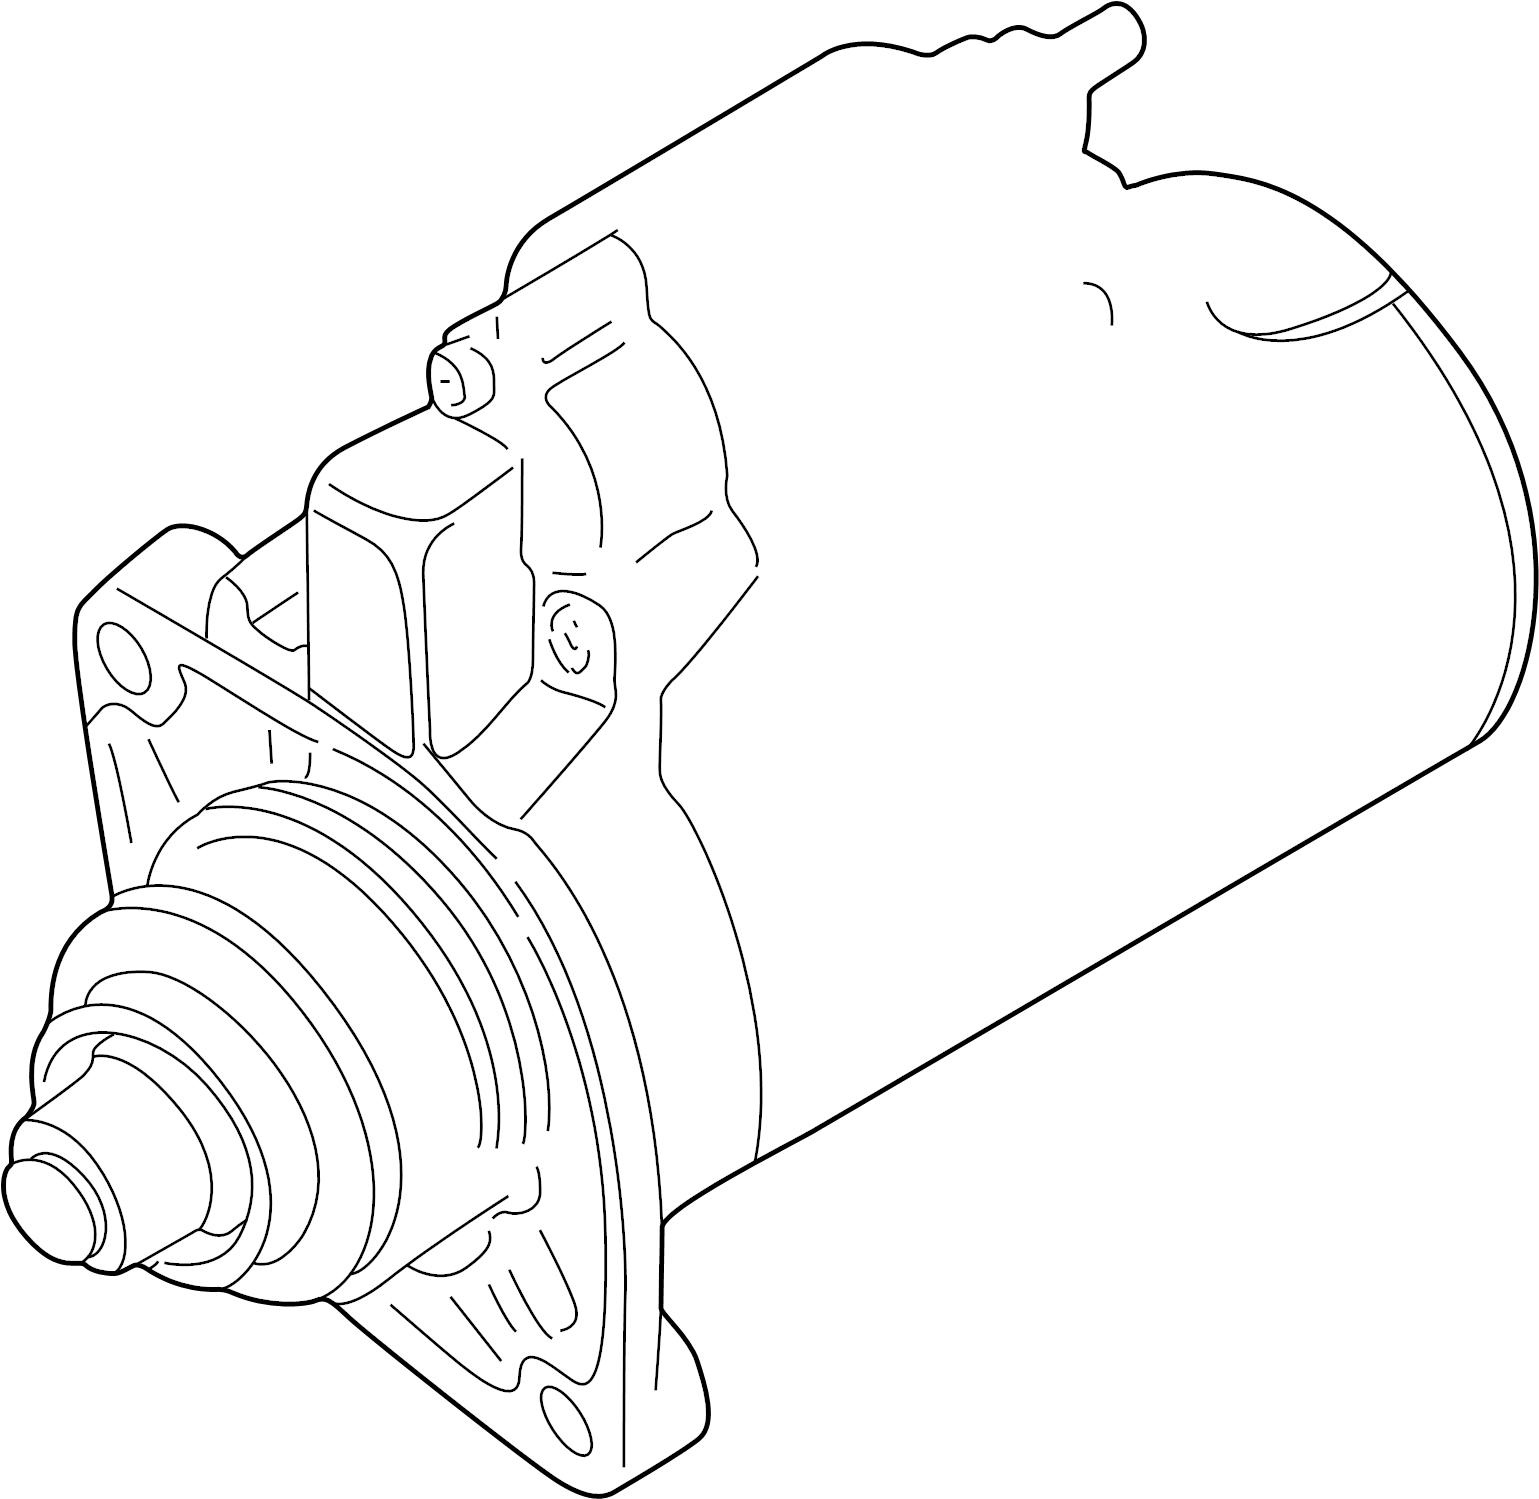 2003 Audi TT Base Coupe 1.8L M/T Quattro Starter Motor